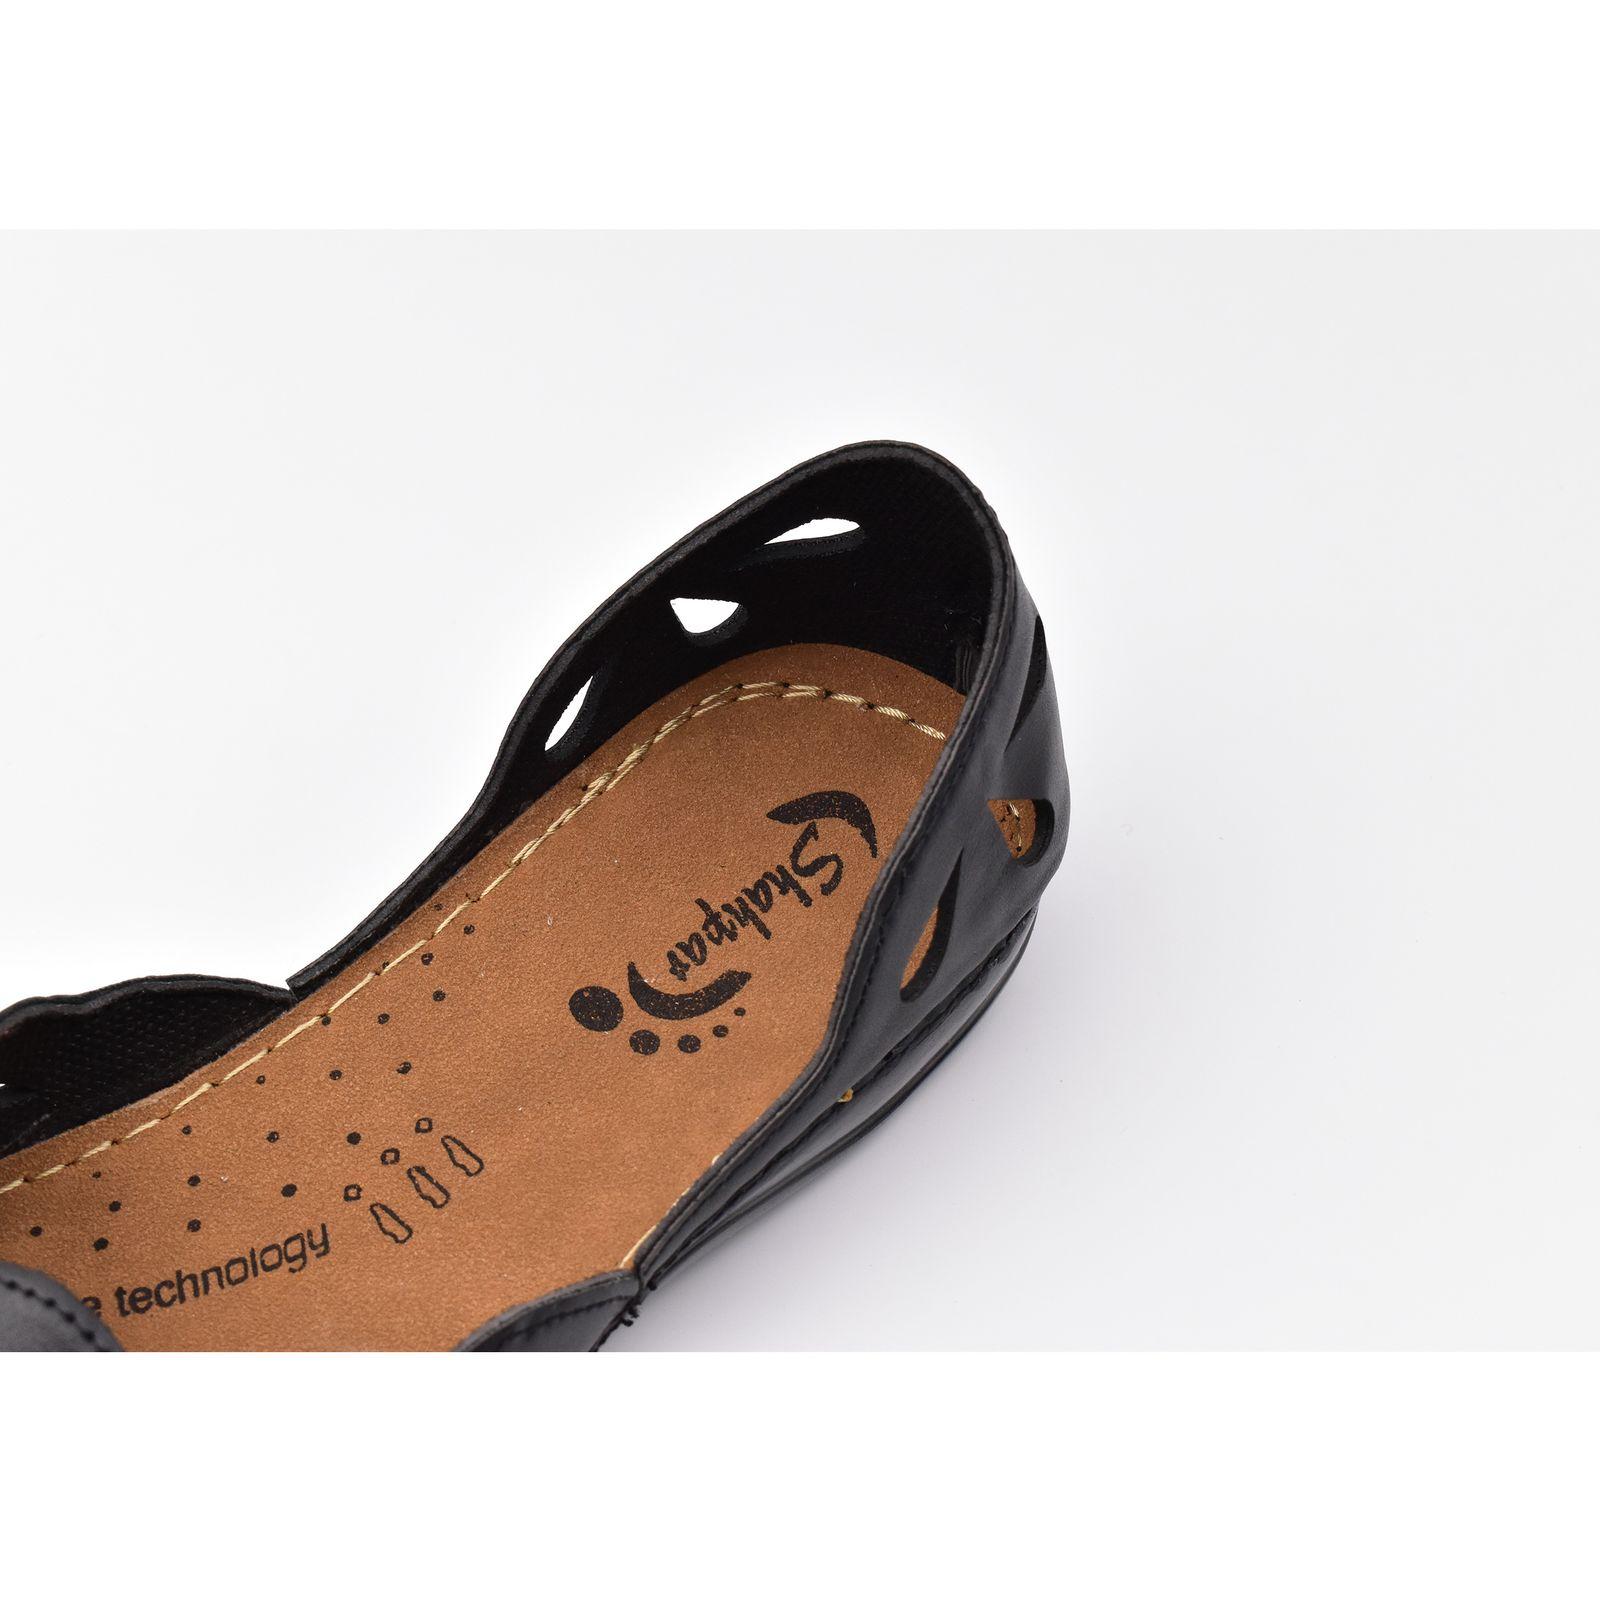 کفش زنانه شهپر مدل رویا 109 کد 7187 -  - 7